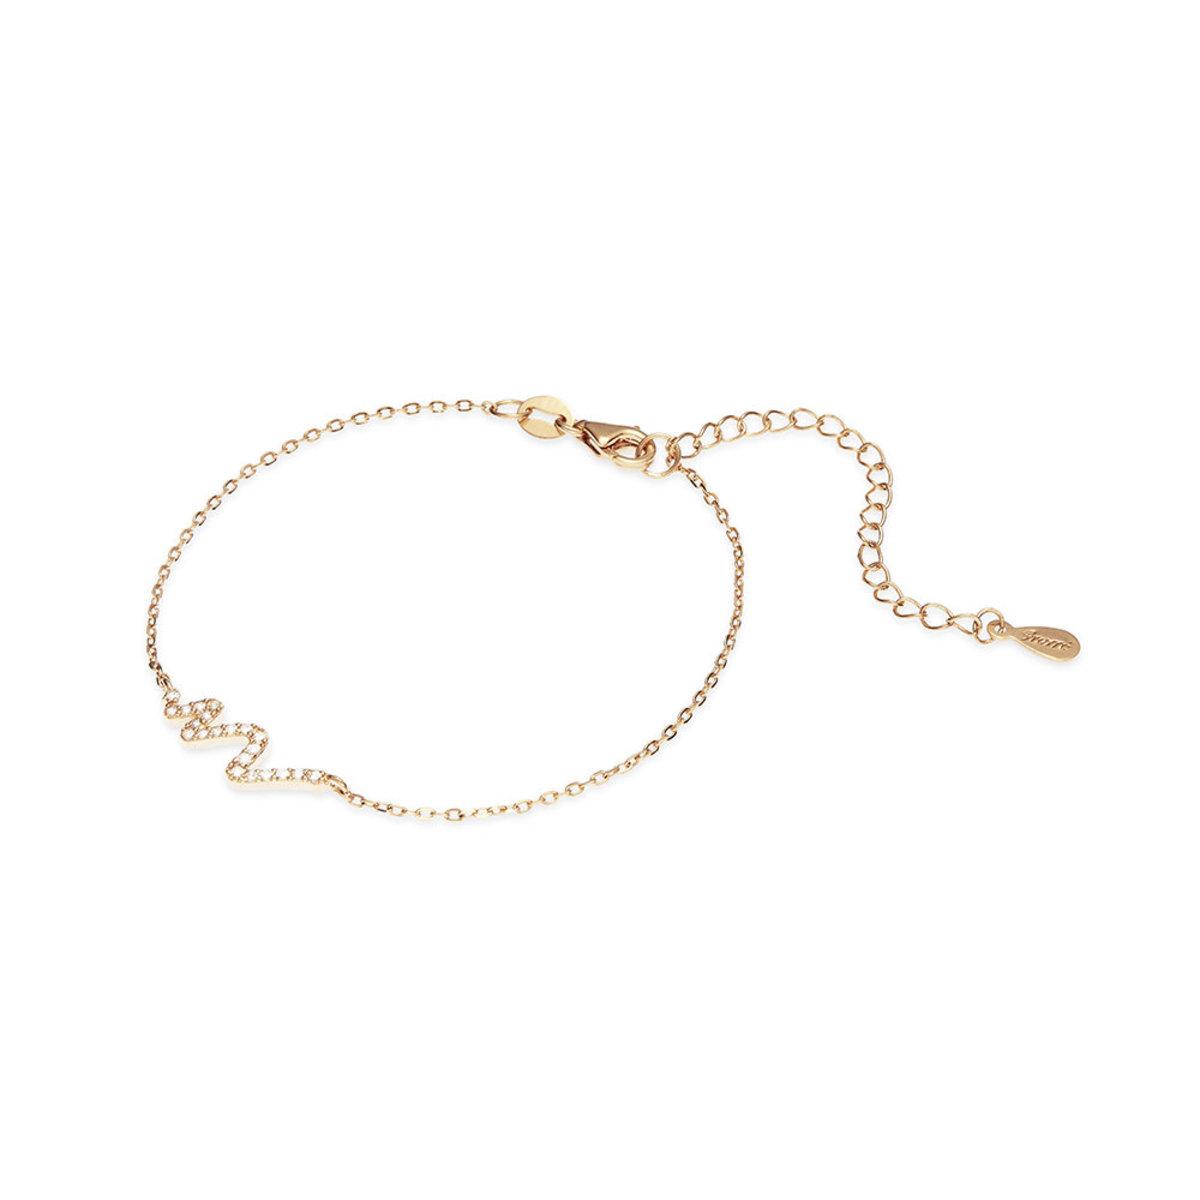 Tresor: 925 silver, rose gold plating, CZ stone bracelet